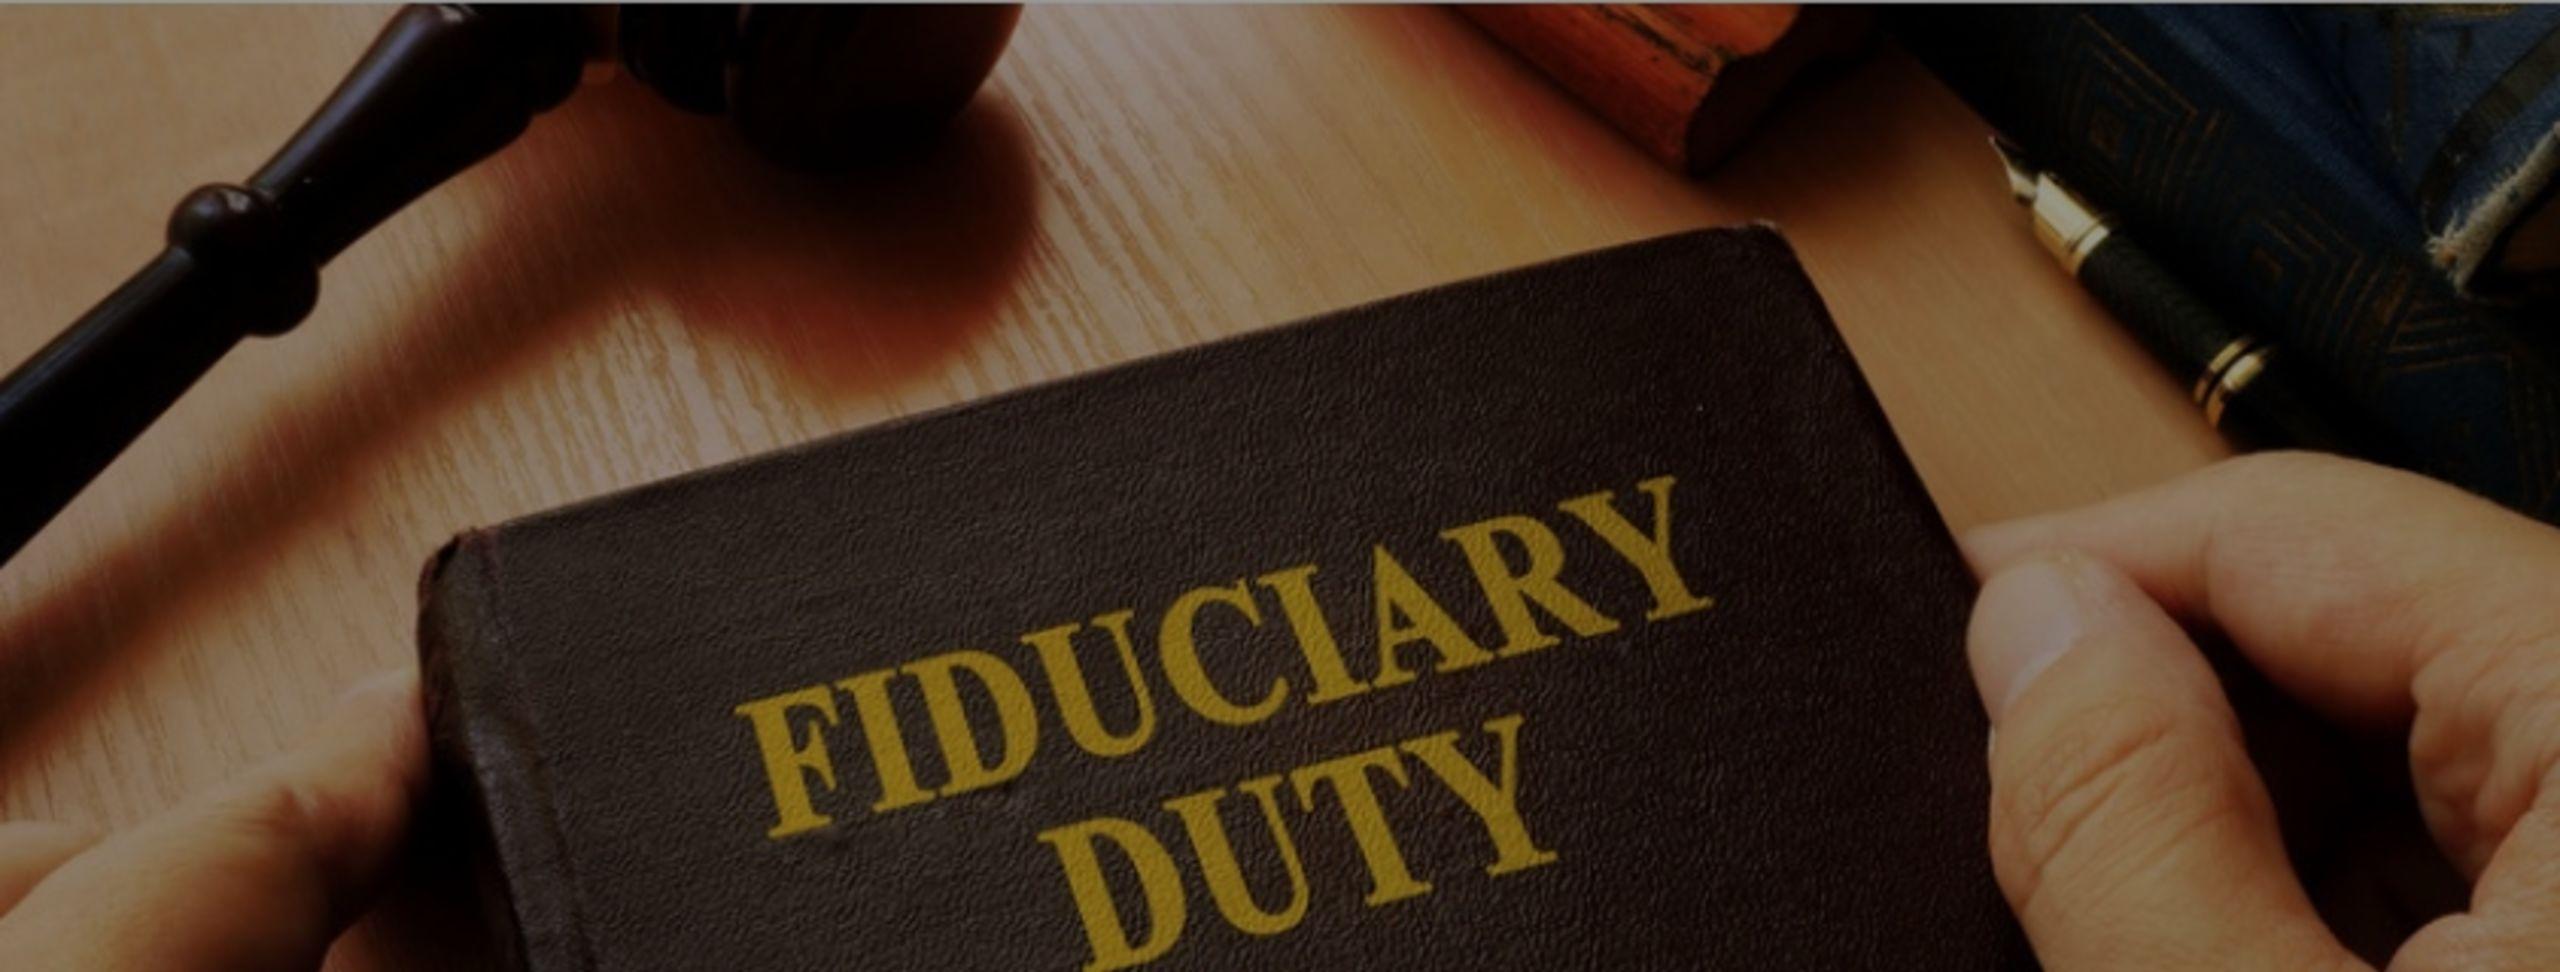 Fiduciary Duties – Loyalty